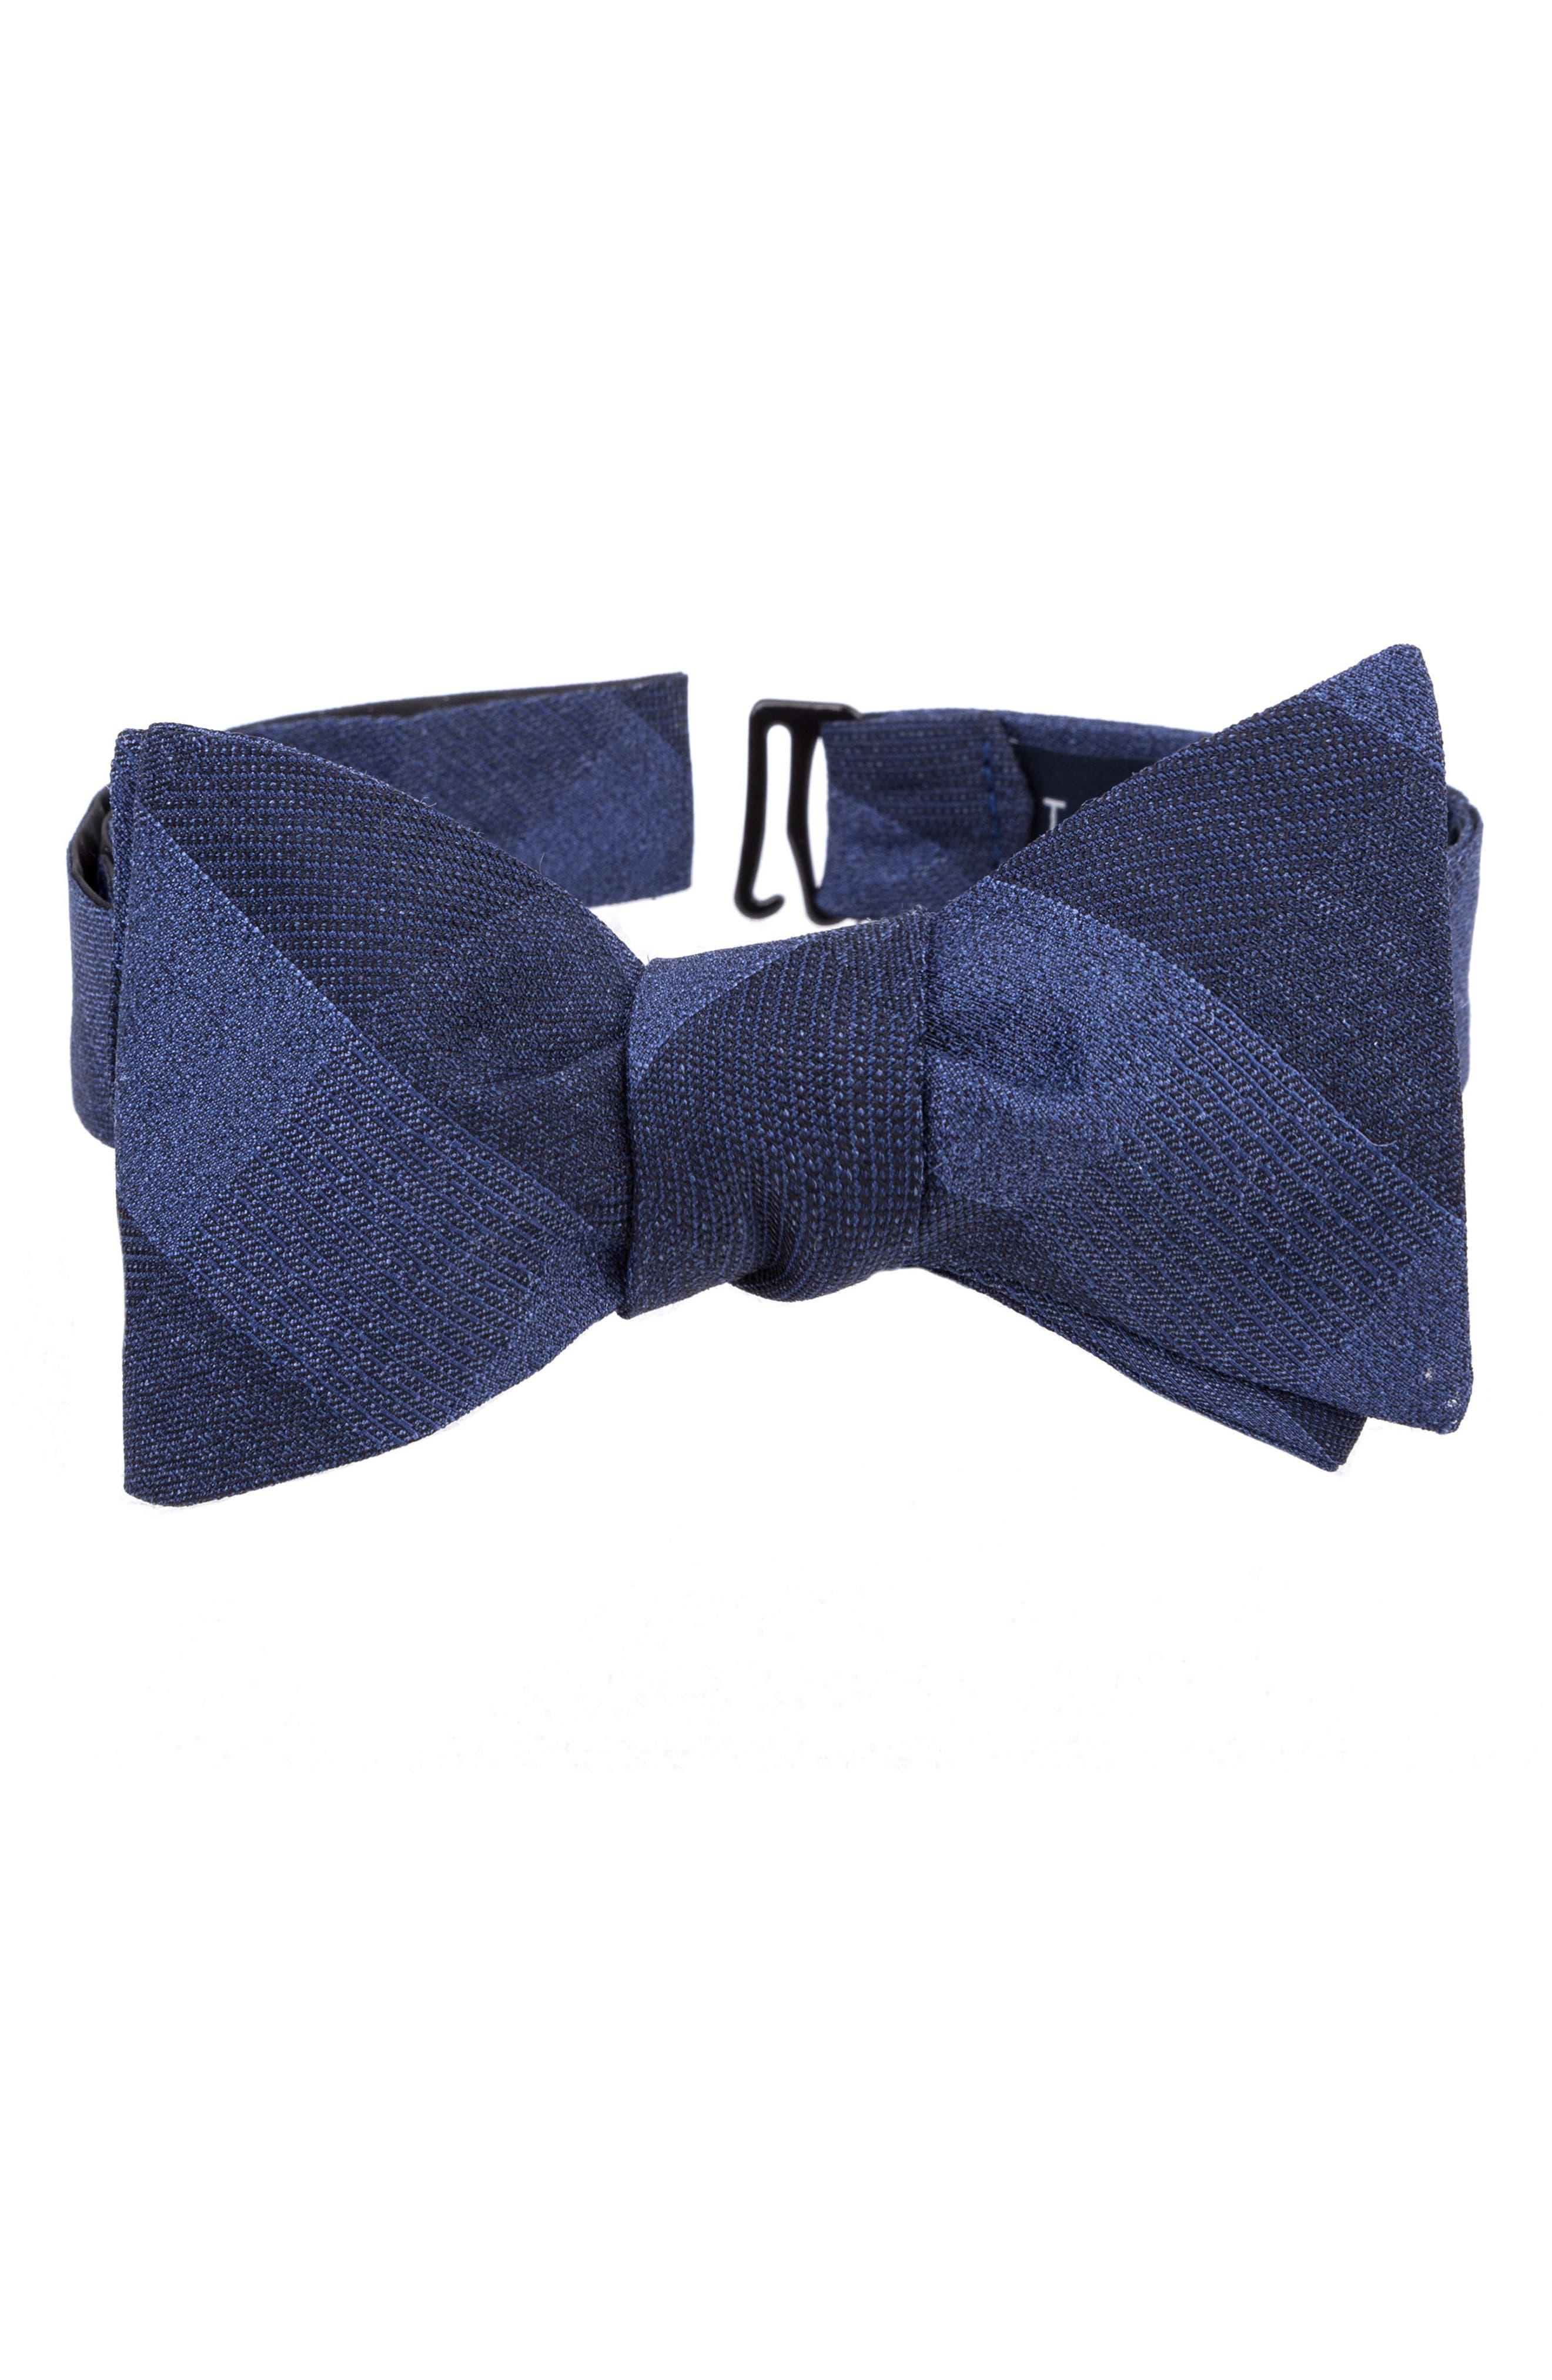 Indigo Wardrobe Silk Bow Tie,                             Main thumbnail 1, color,                             430